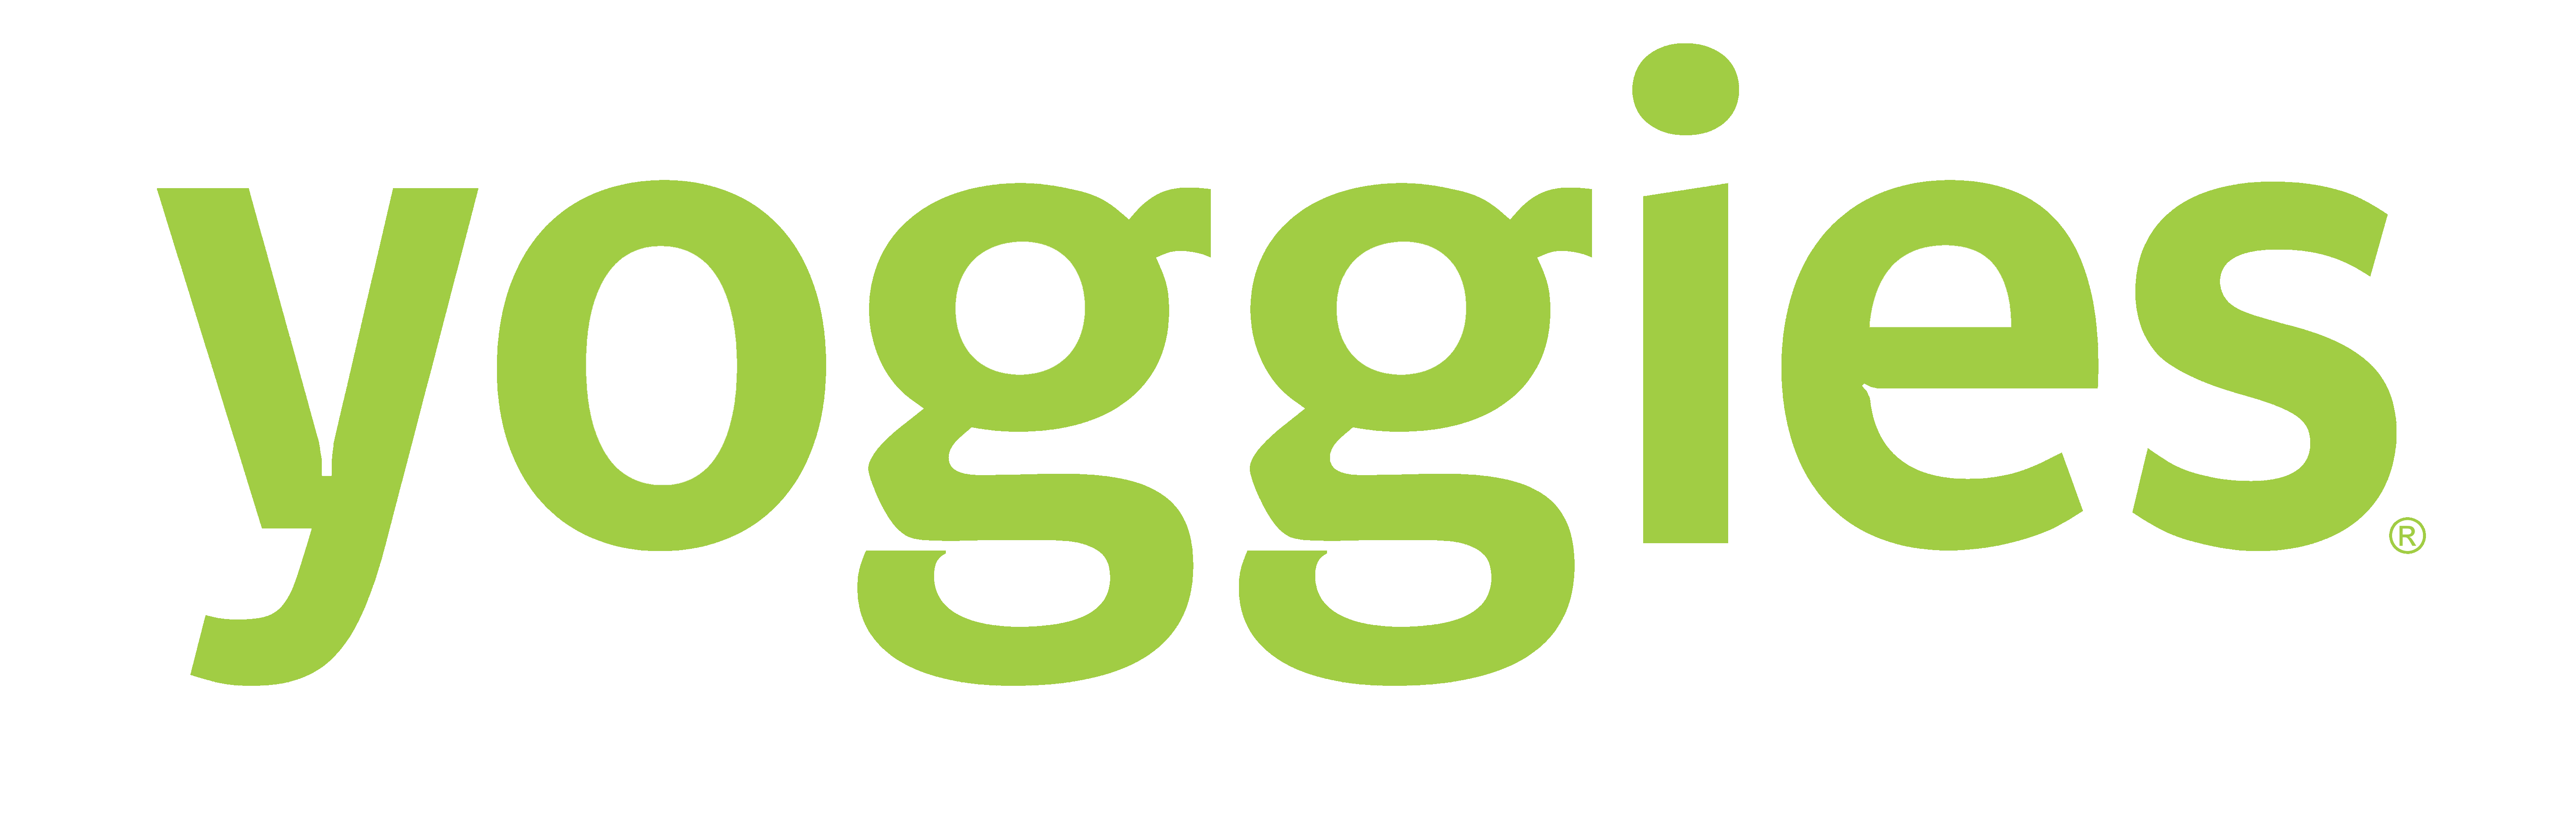 yoggies.jpg